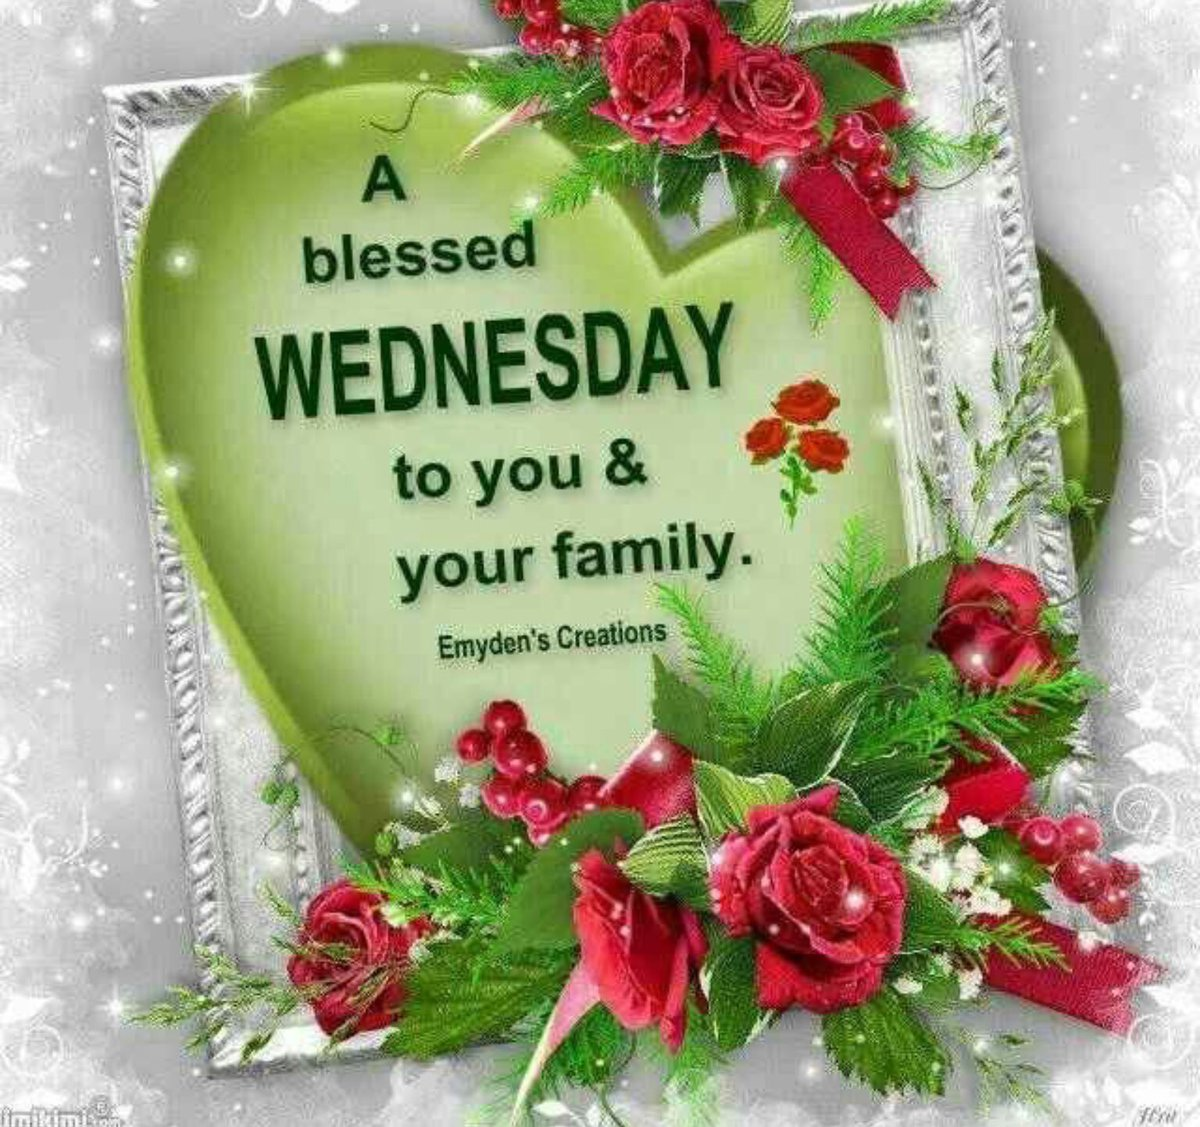 Good morning to all my family and peeps around the world 🥞🥓💚💚 #goodmorning  #wednesday  #wednesdaythought  #wednesdaymotvation  #wednesdayvibes